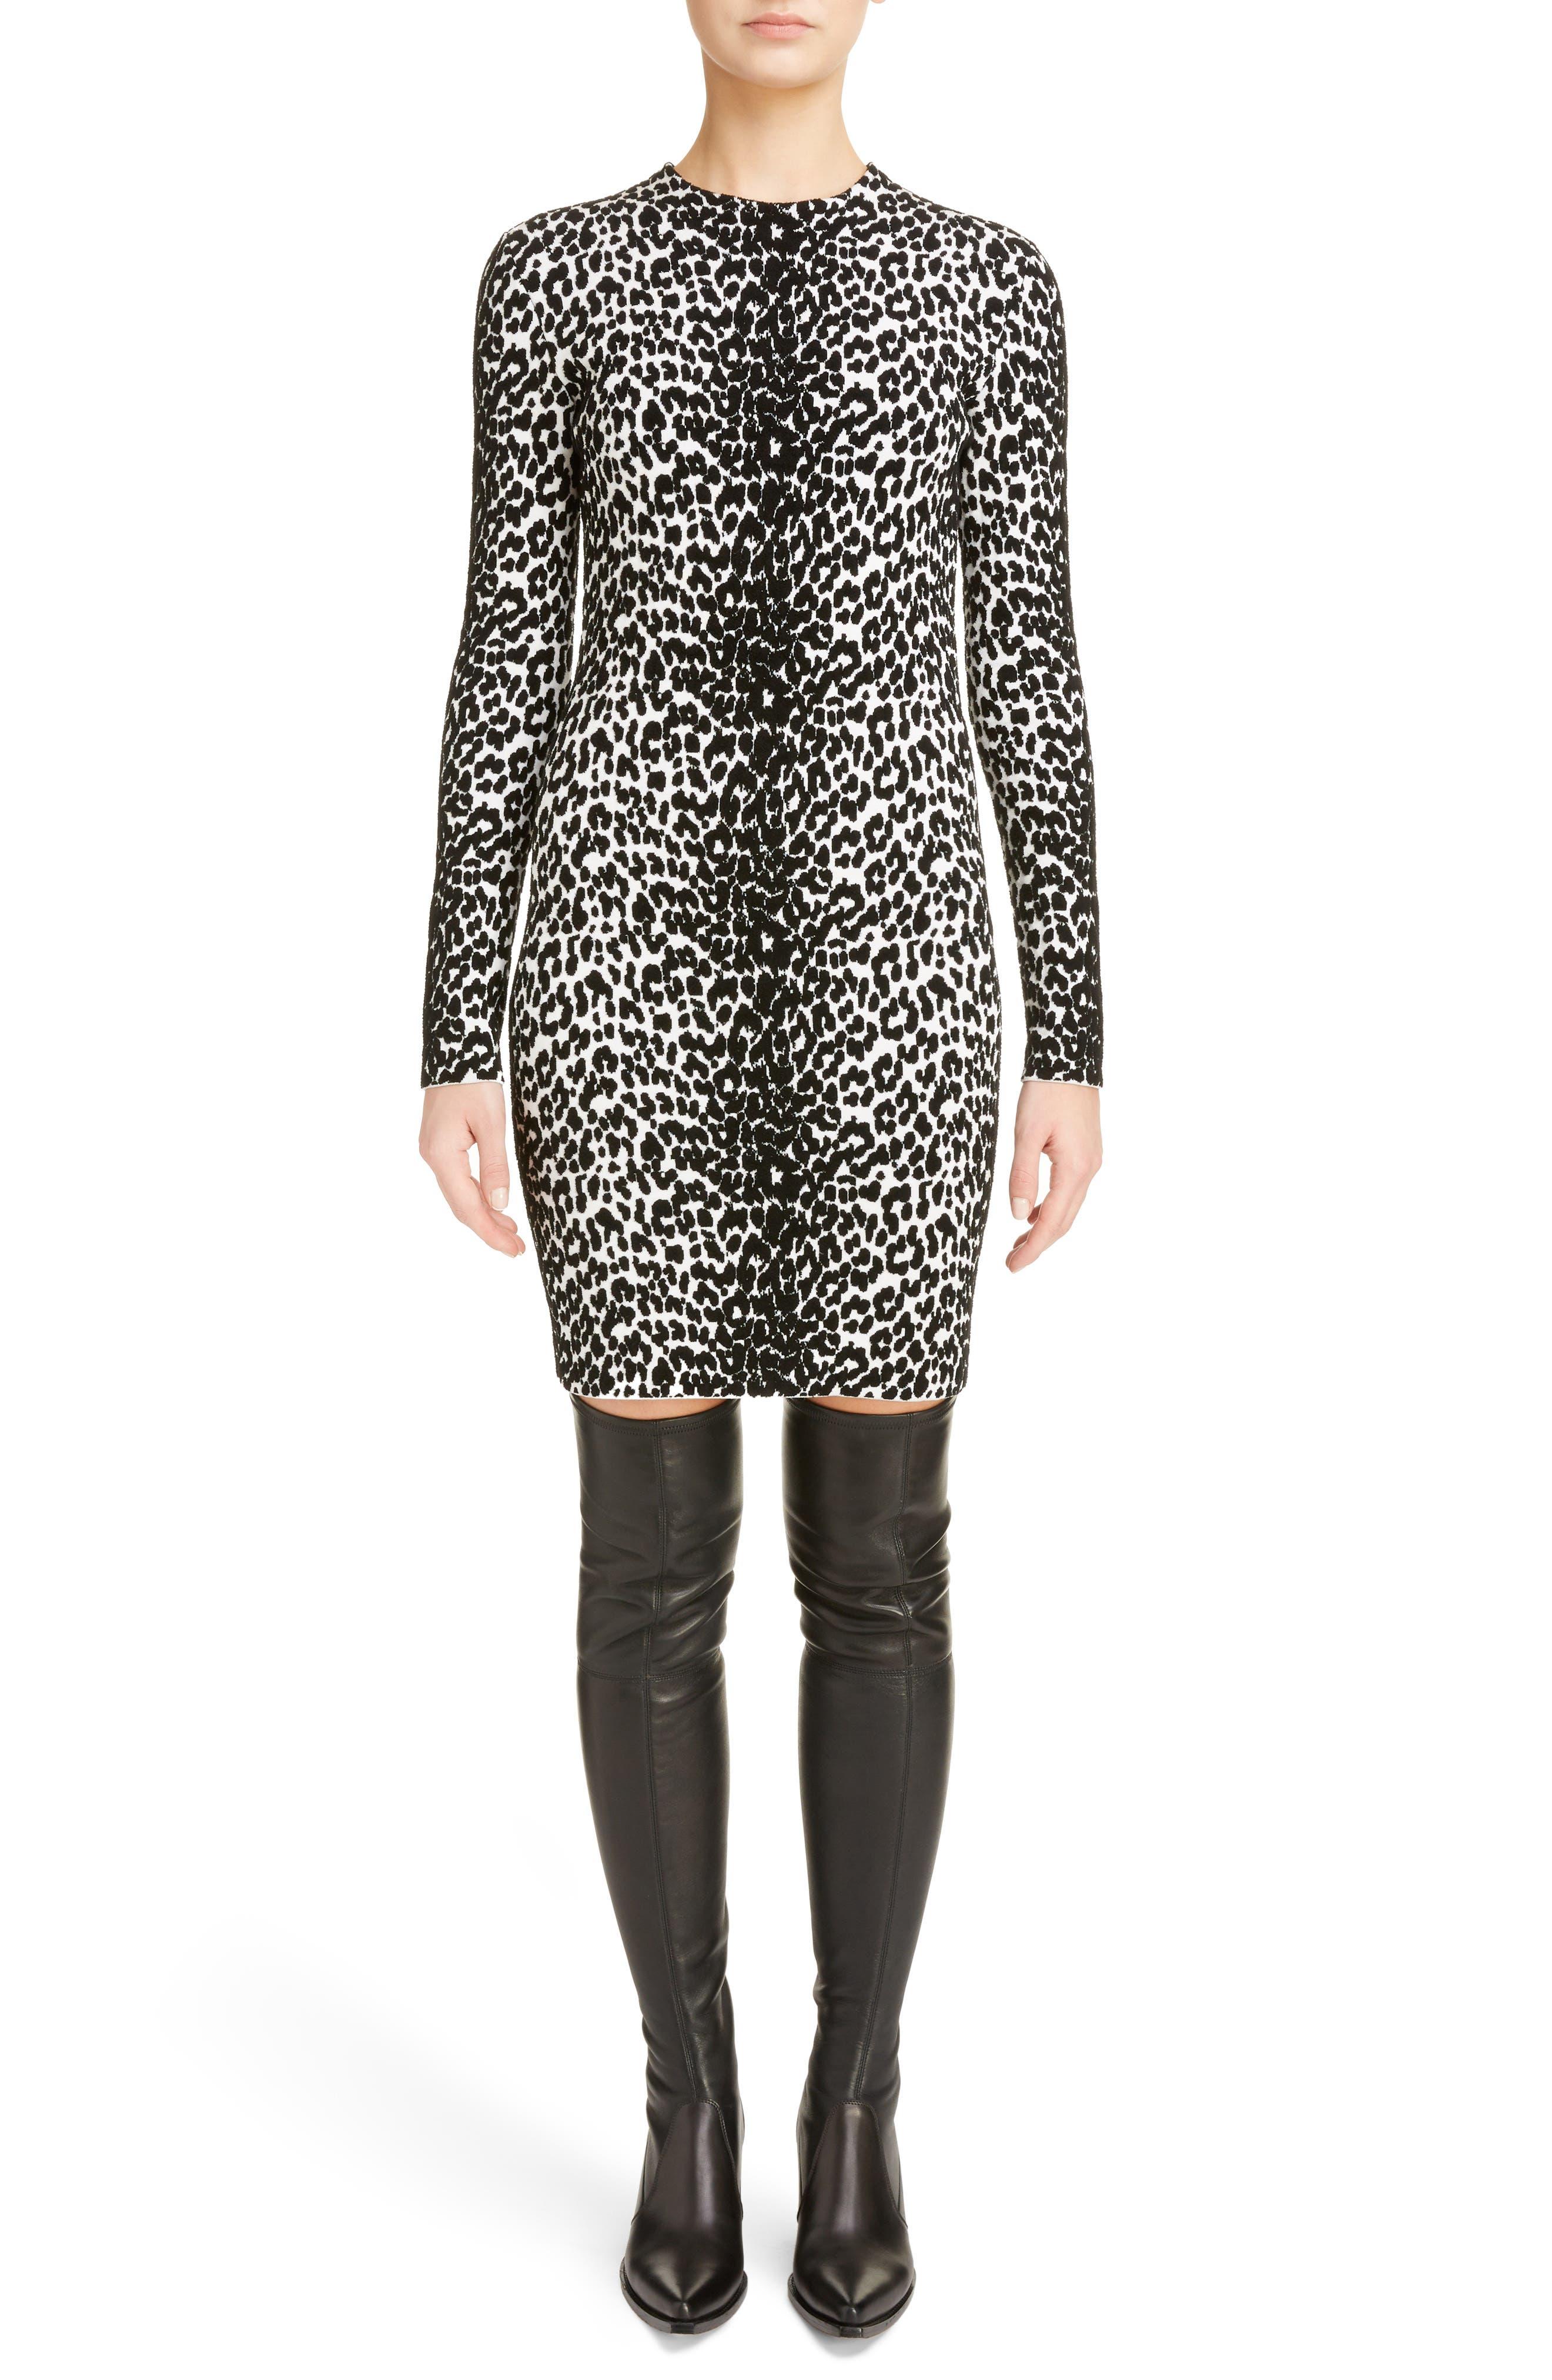 Givenchy Leopard Jacquard Body-Con Dress, Black